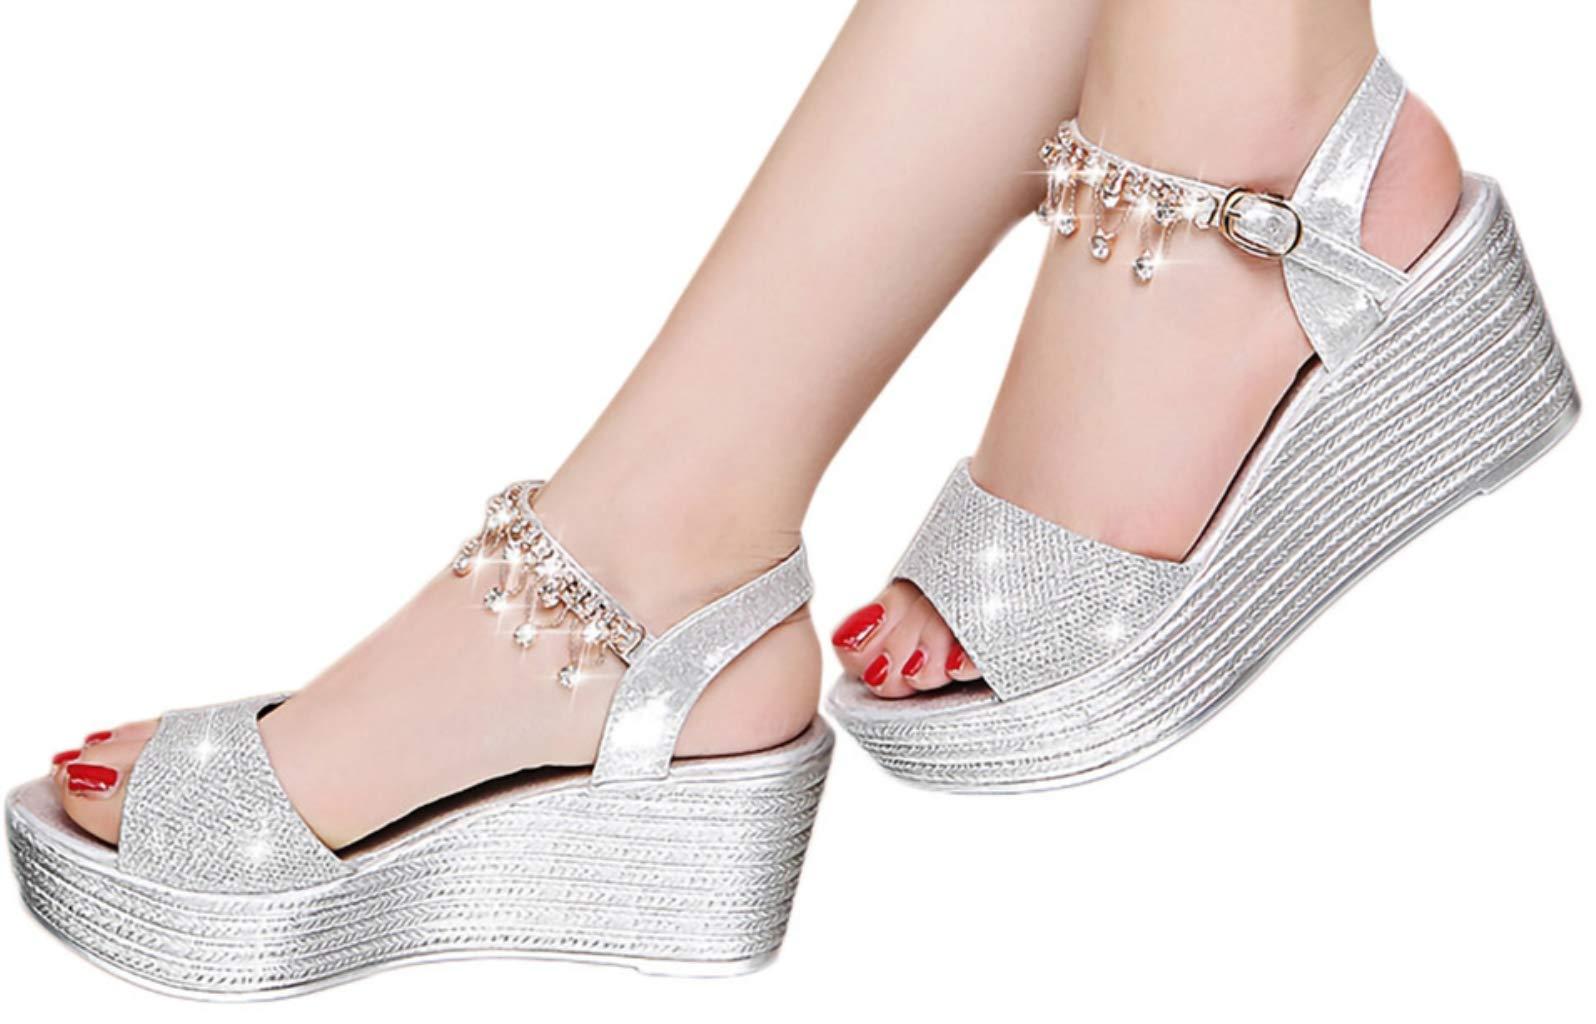 Hemlock Women Fashion Sequin Wedge Sandals Pear Belt Buckle Sandals Thick Platform Sandals Party Princess Sandals Shoes Silver